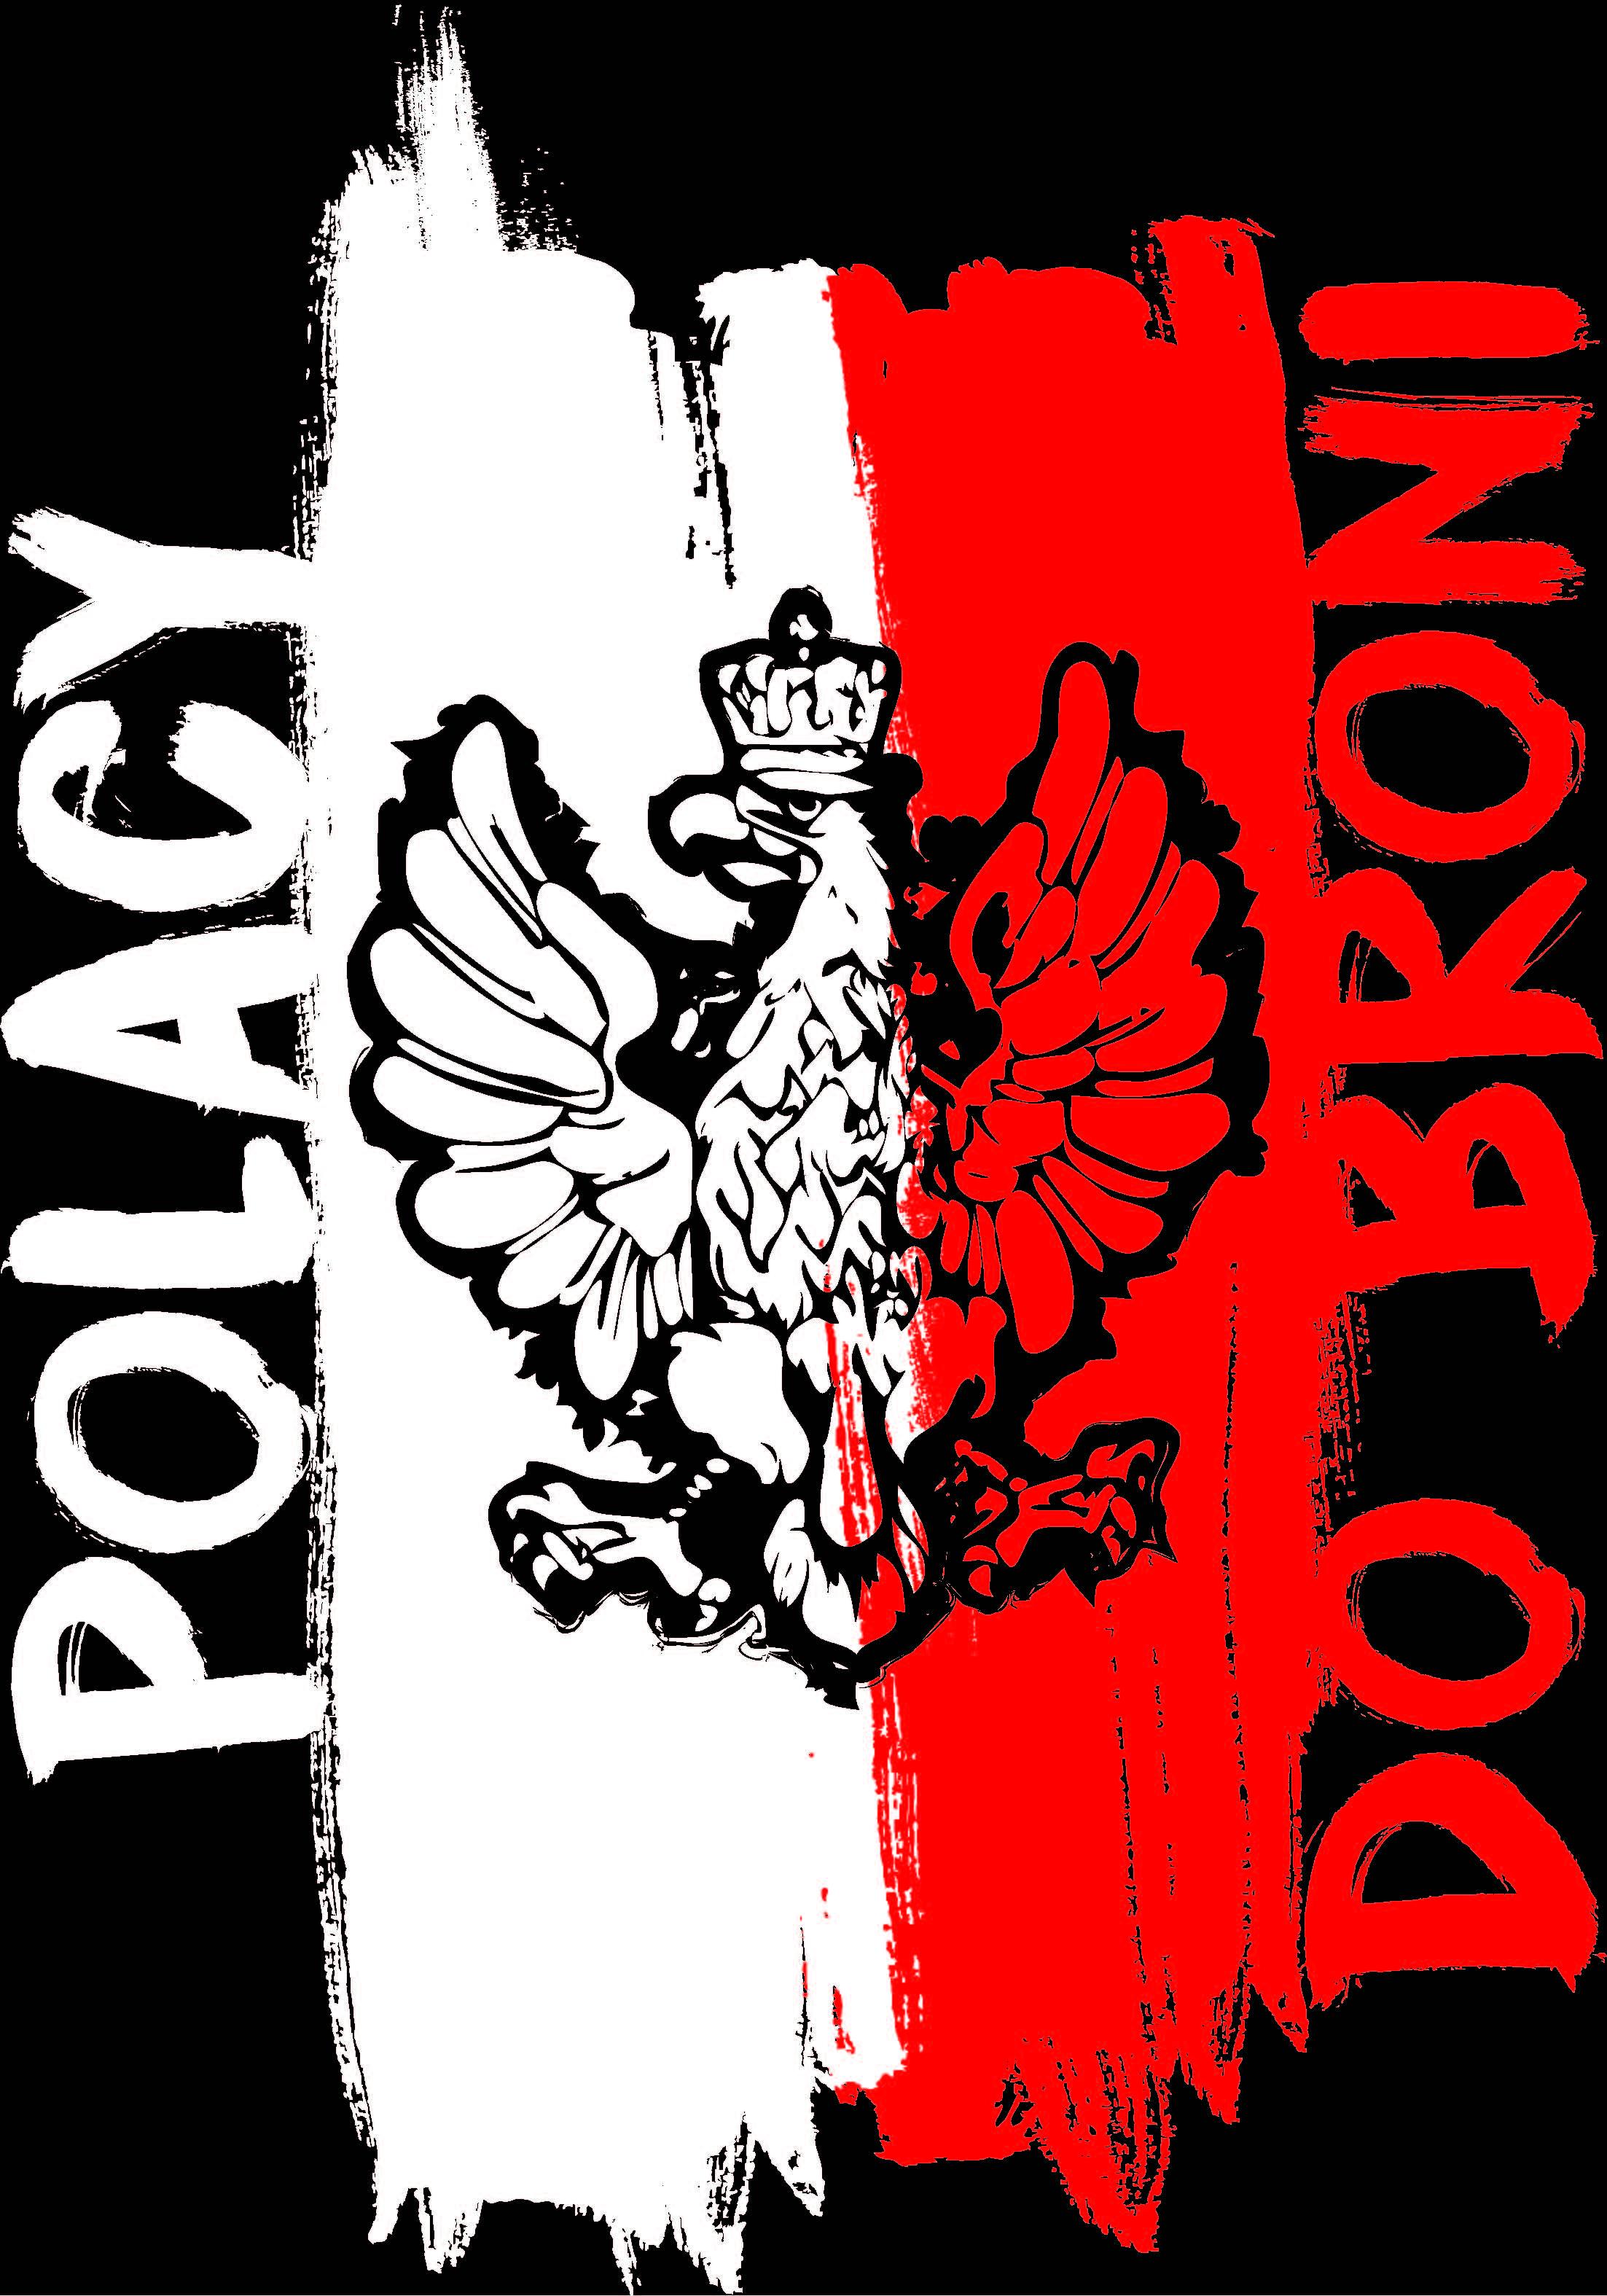 orzel polacy do broni